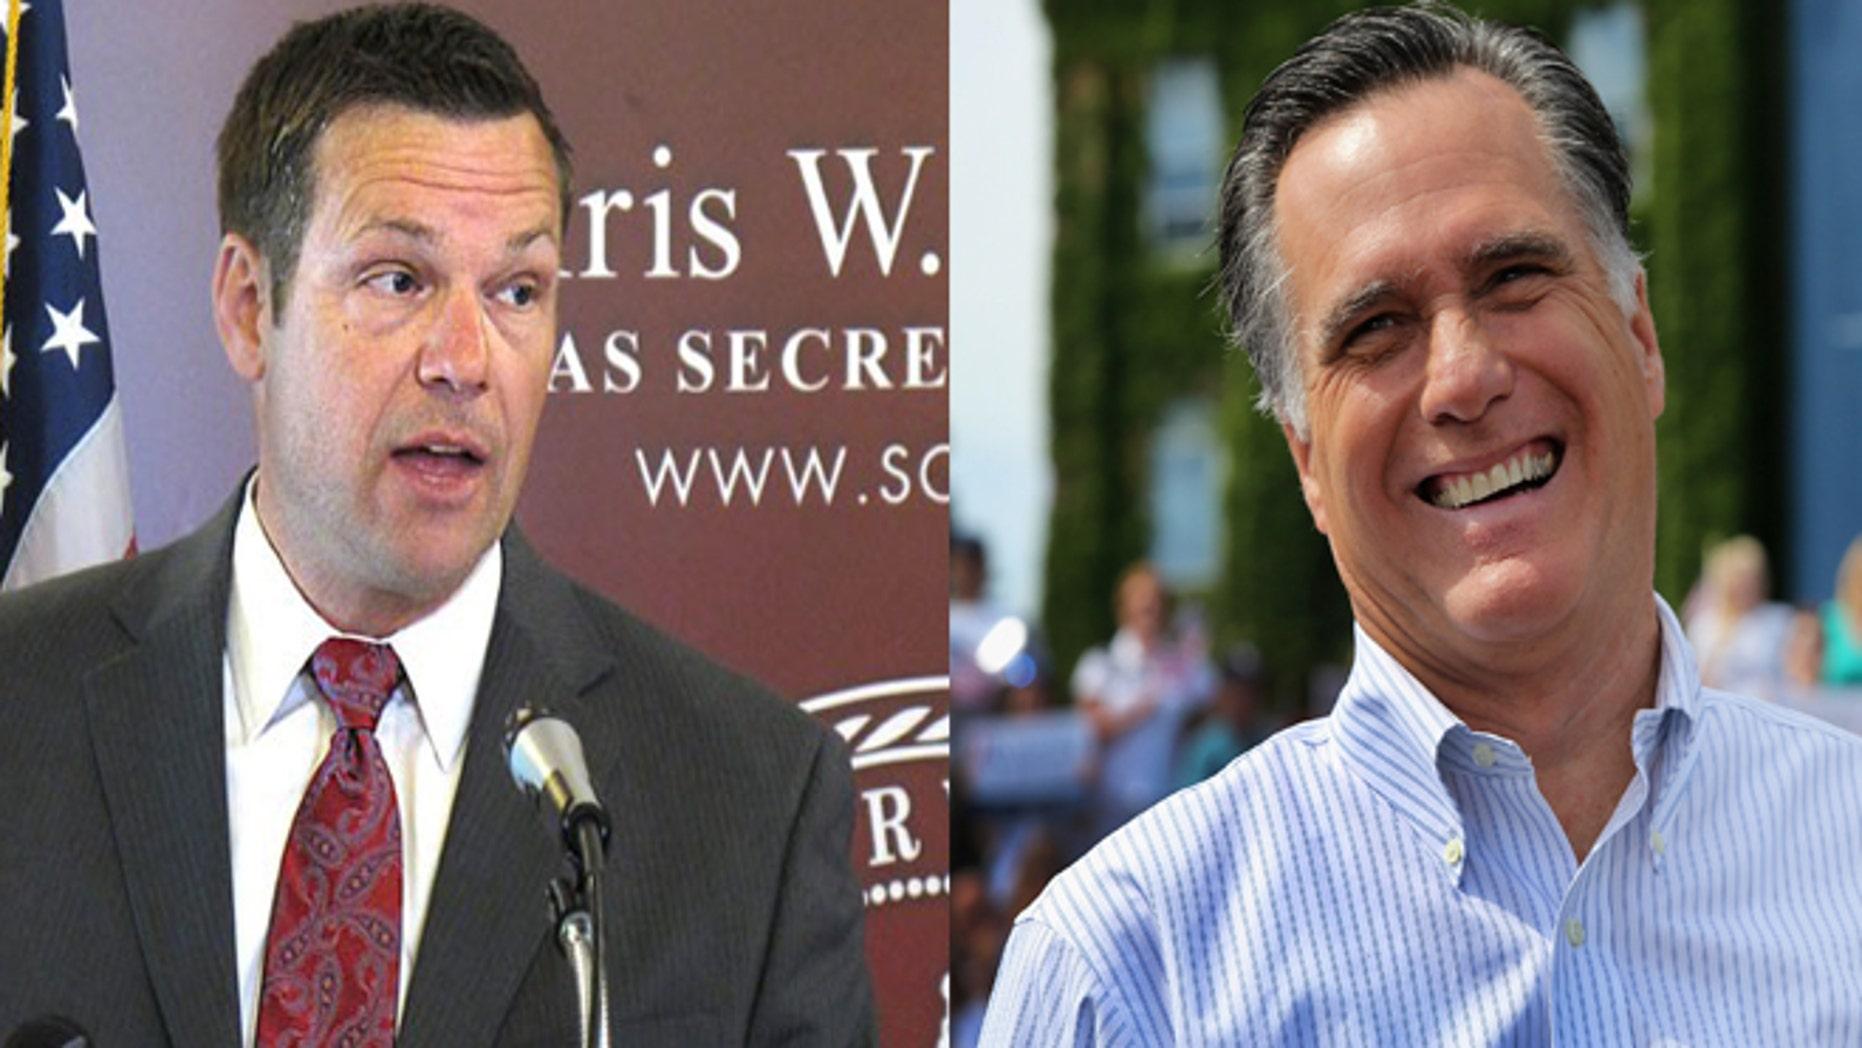 Kansas Secretary of State Kris Kobach, left; presumptive GOP presidential nominee Mitt Romney, right